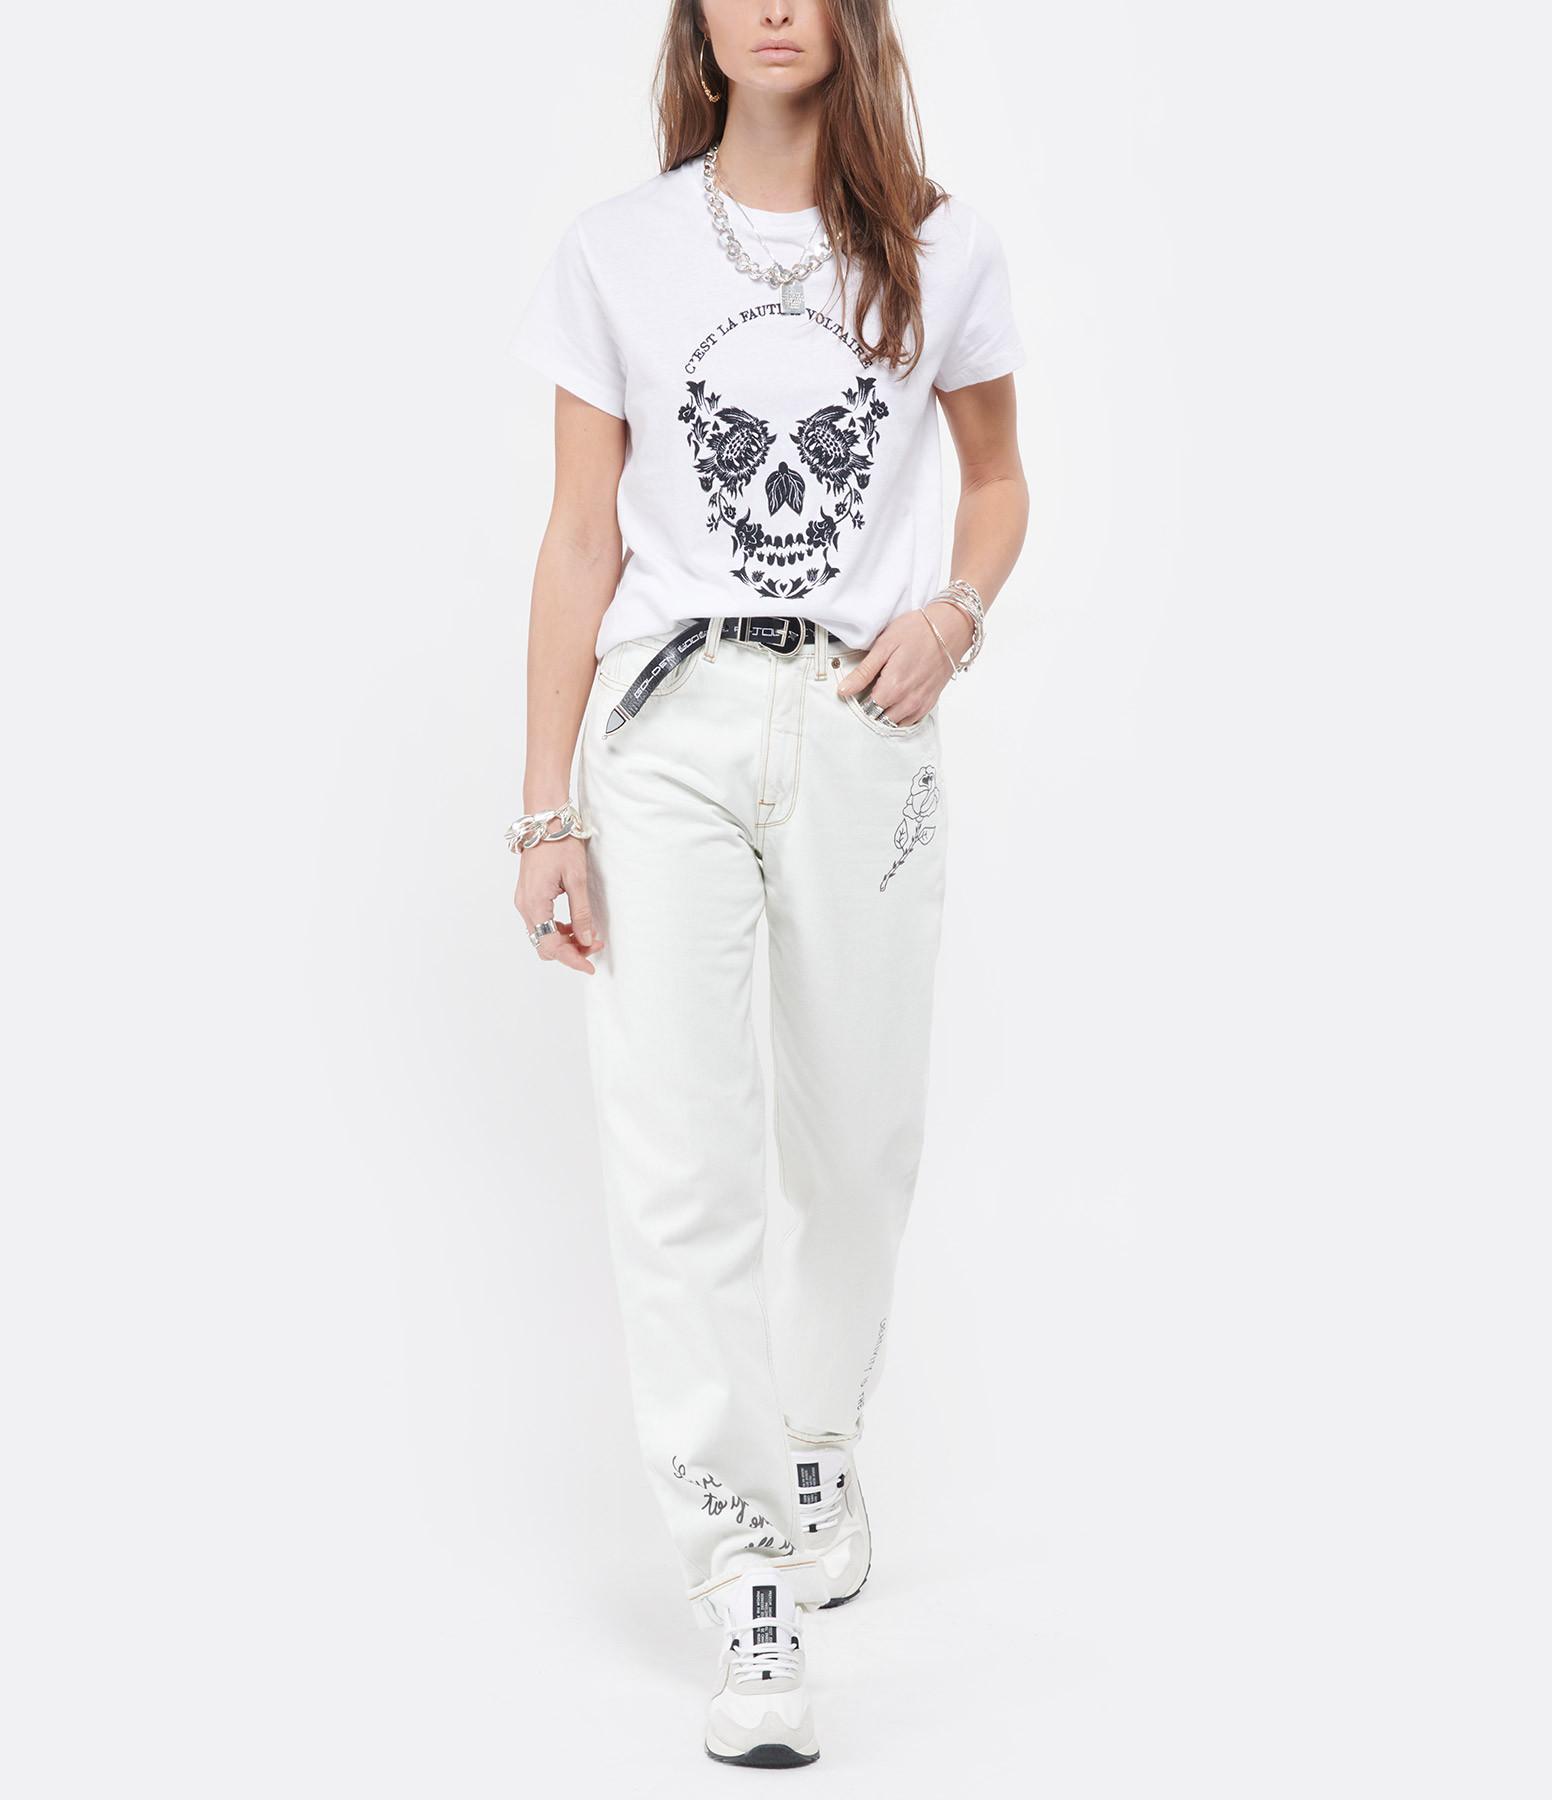 ZADIG & VOLTAIRE - Tee-shirt Zoé Skull VLTR Coton Blanc